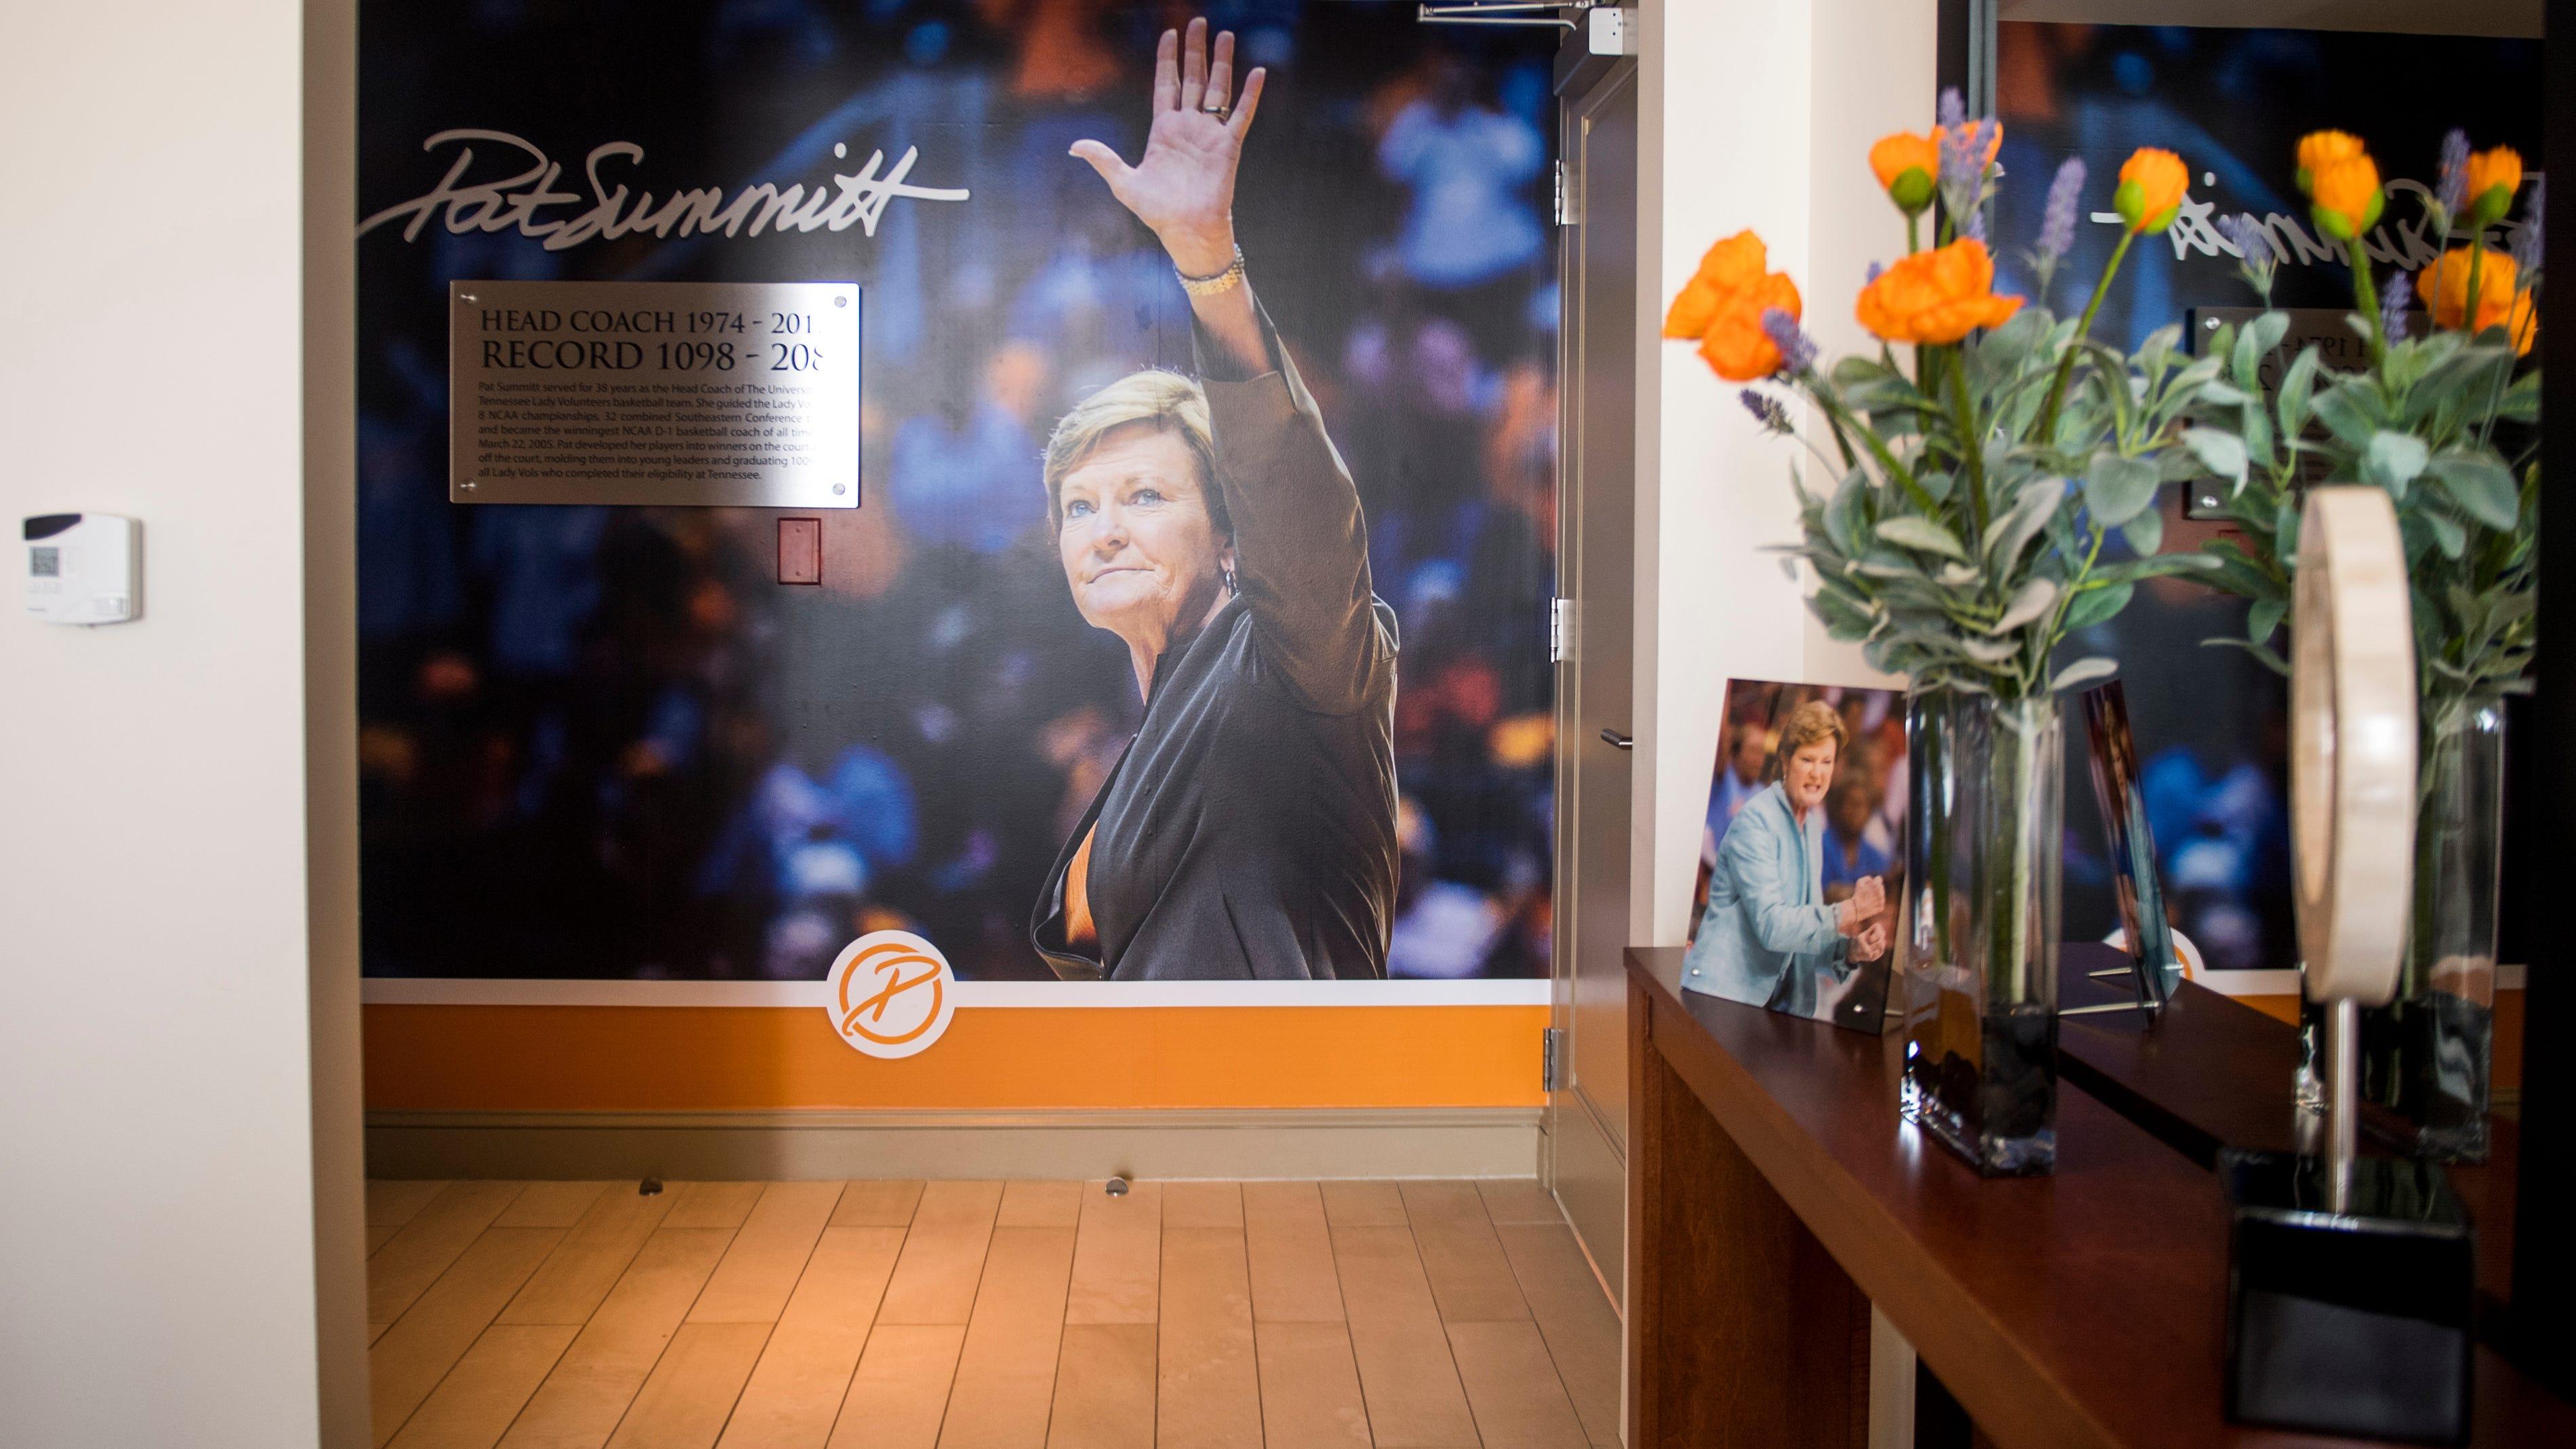 Pat Summitt Suite dedicated at The Tennessean Hotel